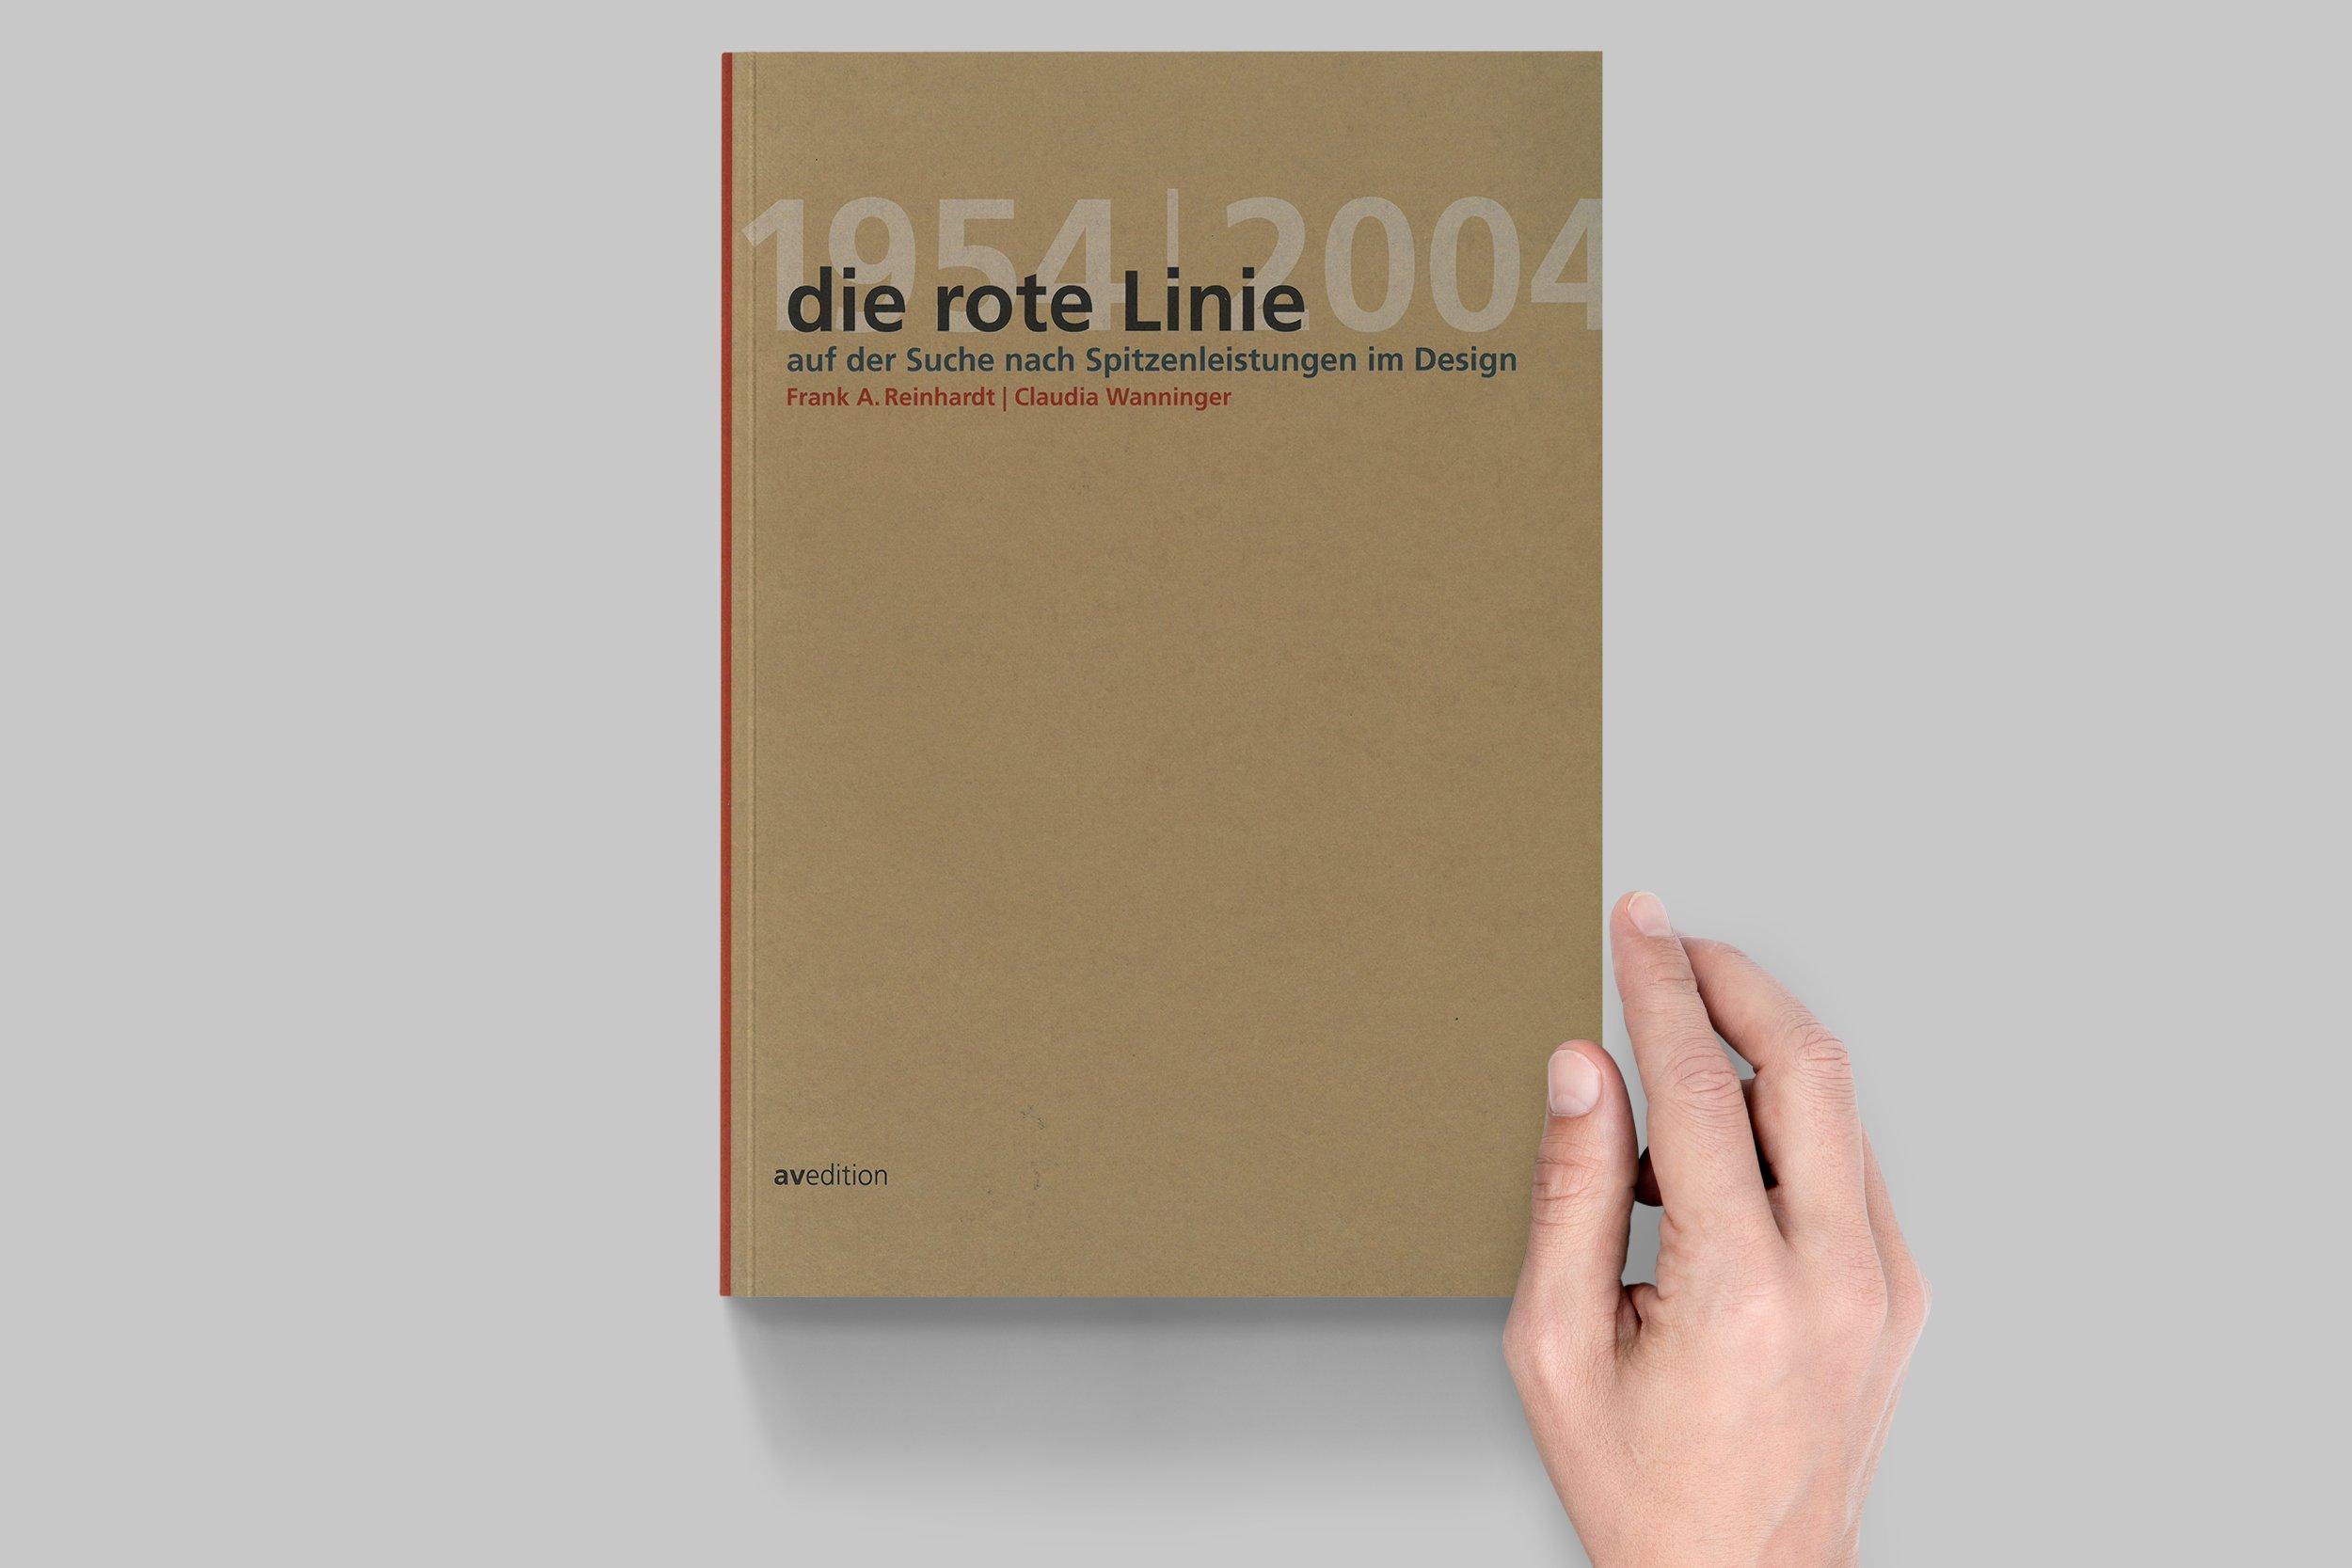 https://farconsulting.de/wp-content/uploads/2004/10/Die-rote-Linie_Titel2.jpg